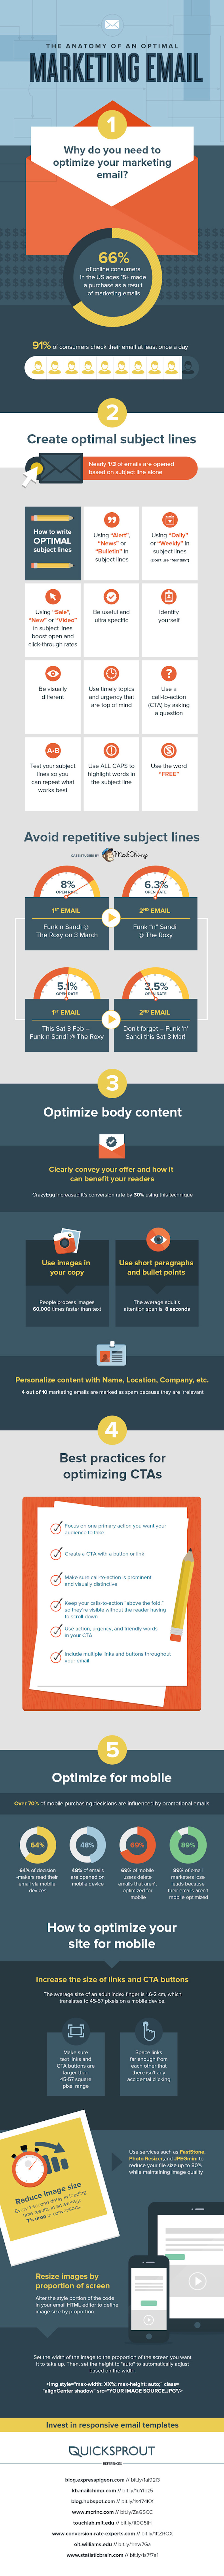 comment optimiser vos emails marketingcomment optimiser vos emails marketing